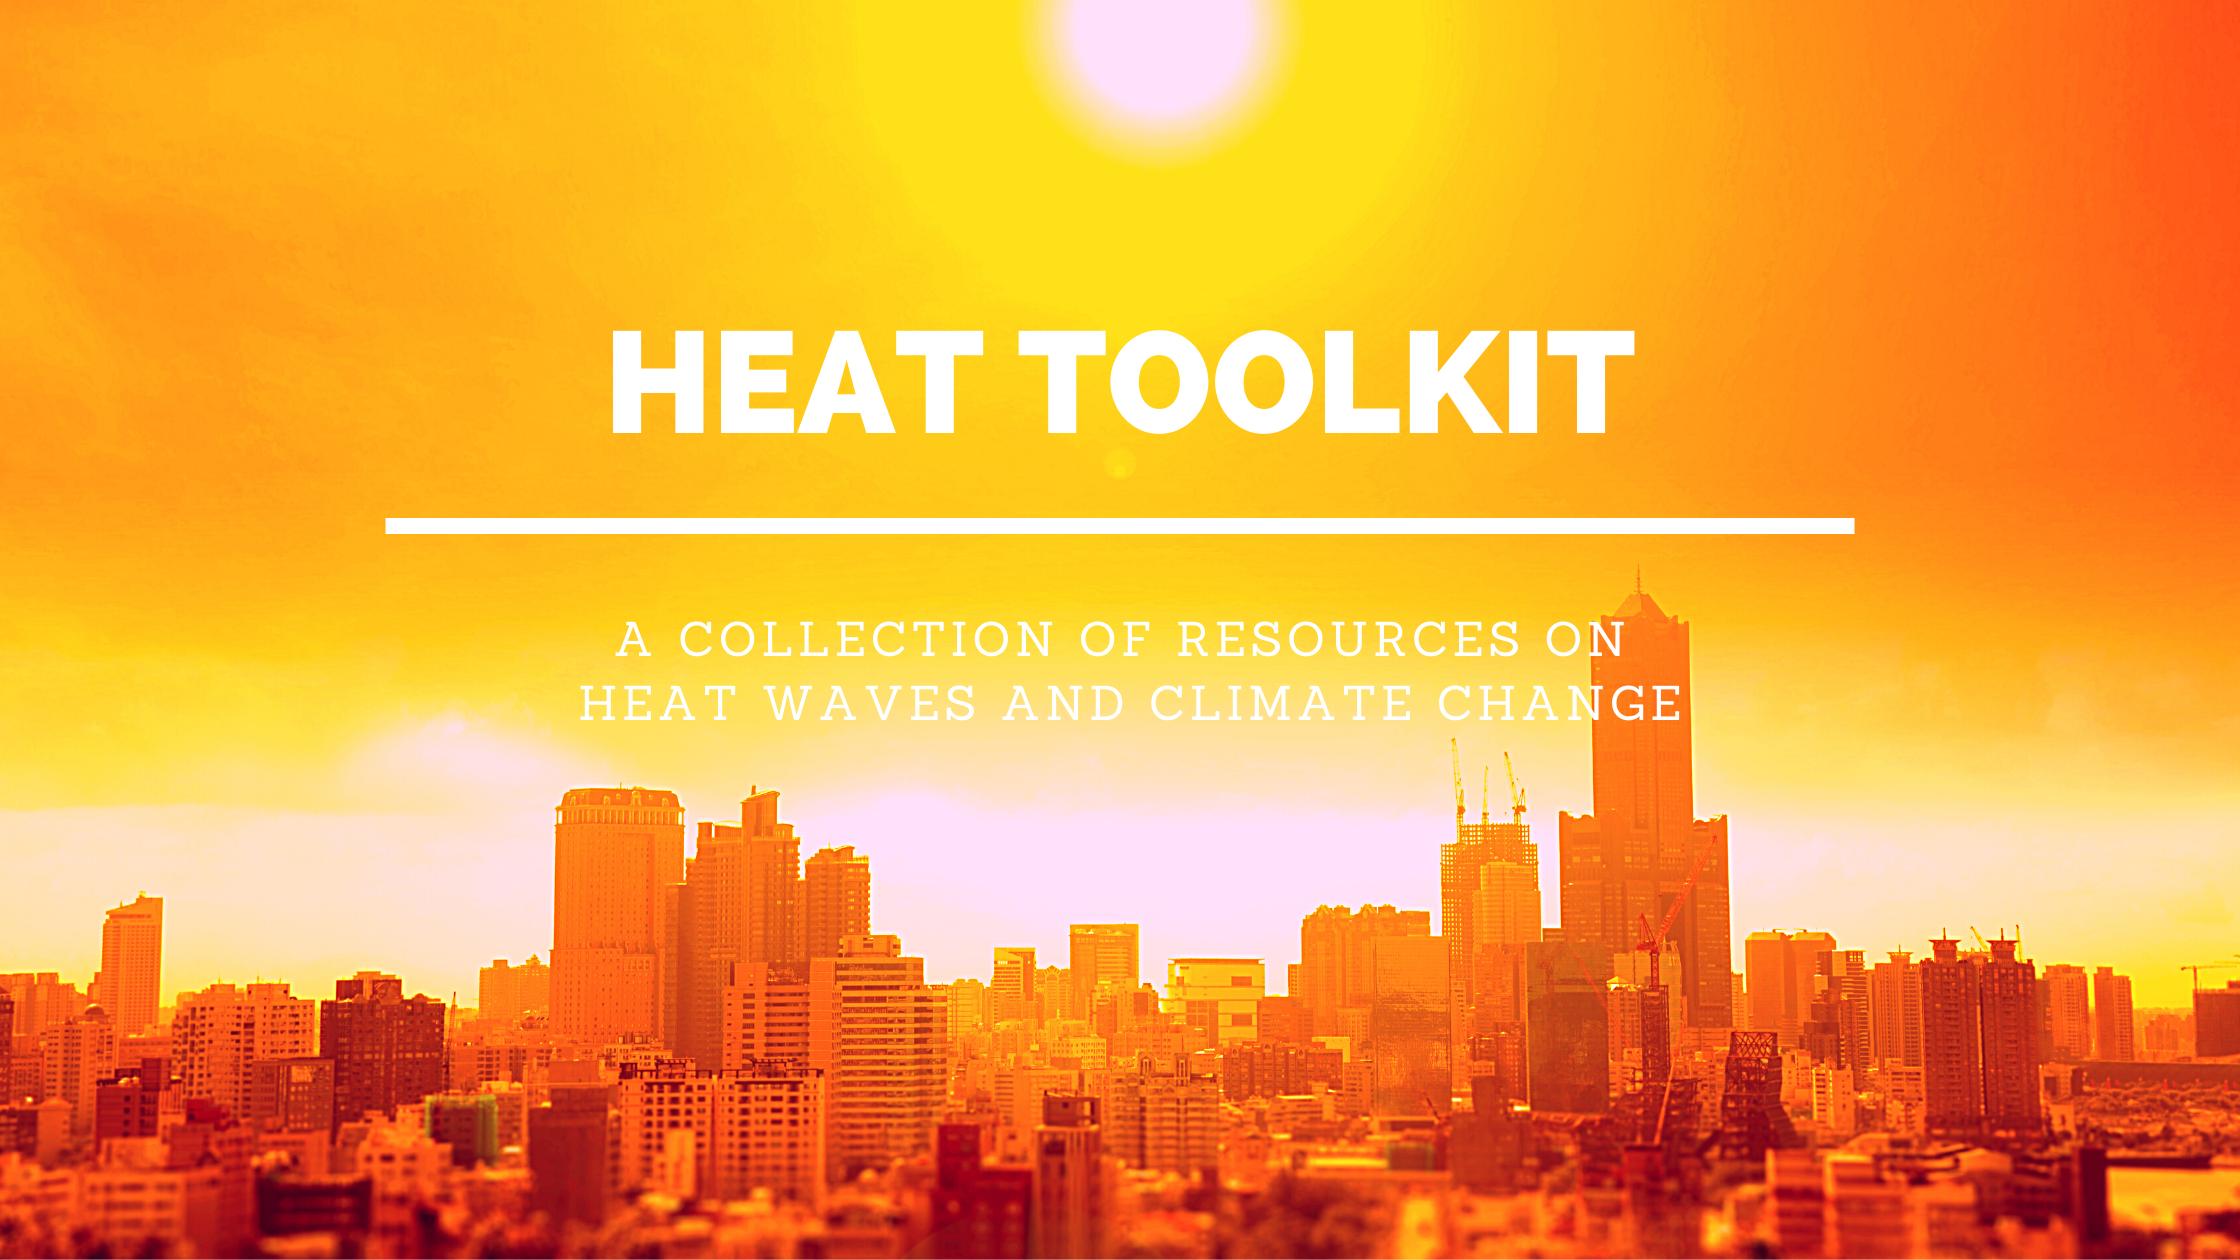 Heatwave Toolkit